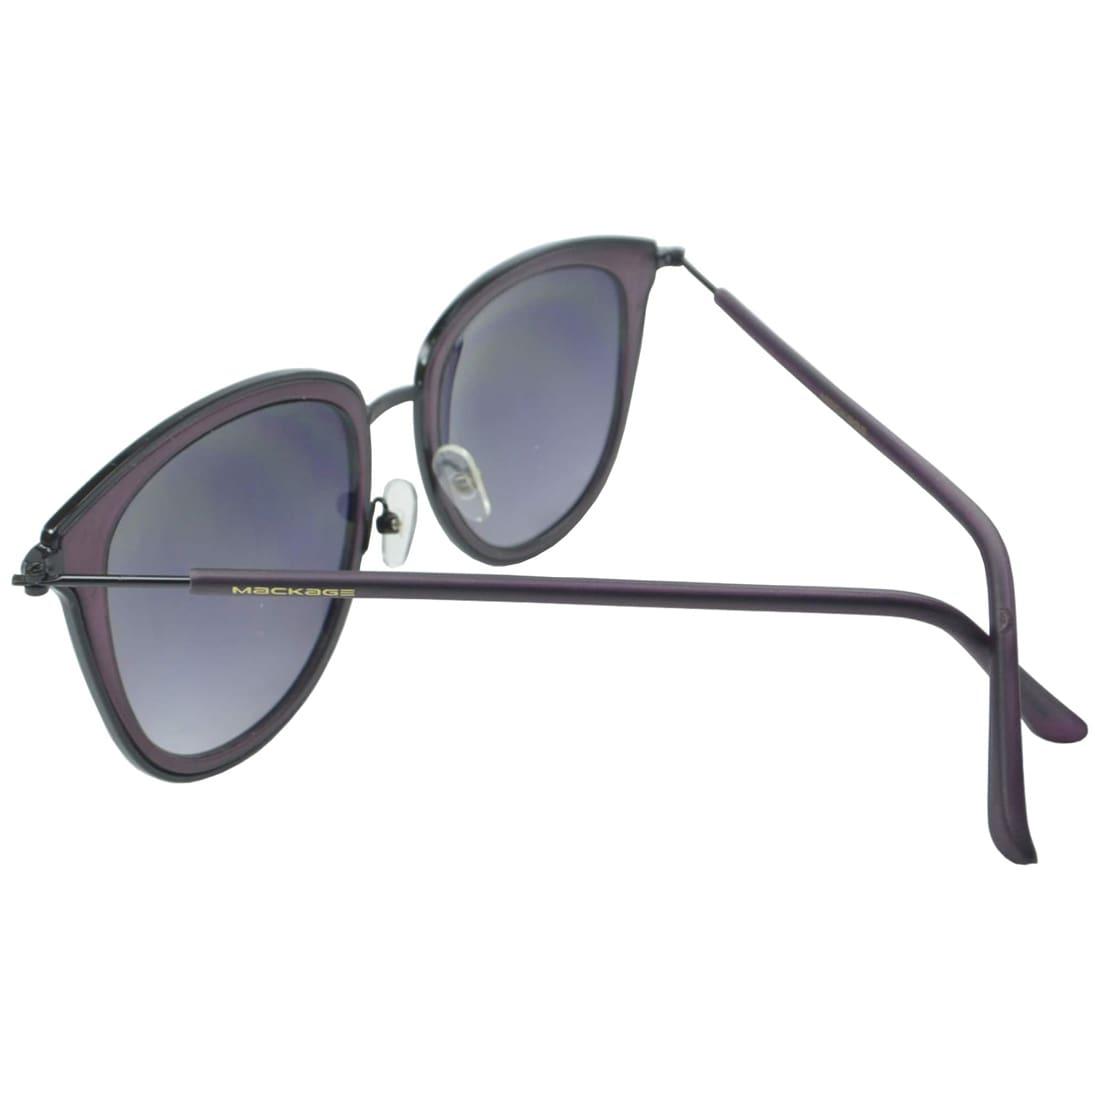 Óculos de Sol Mackage MK581P Roxo com Lente Preta